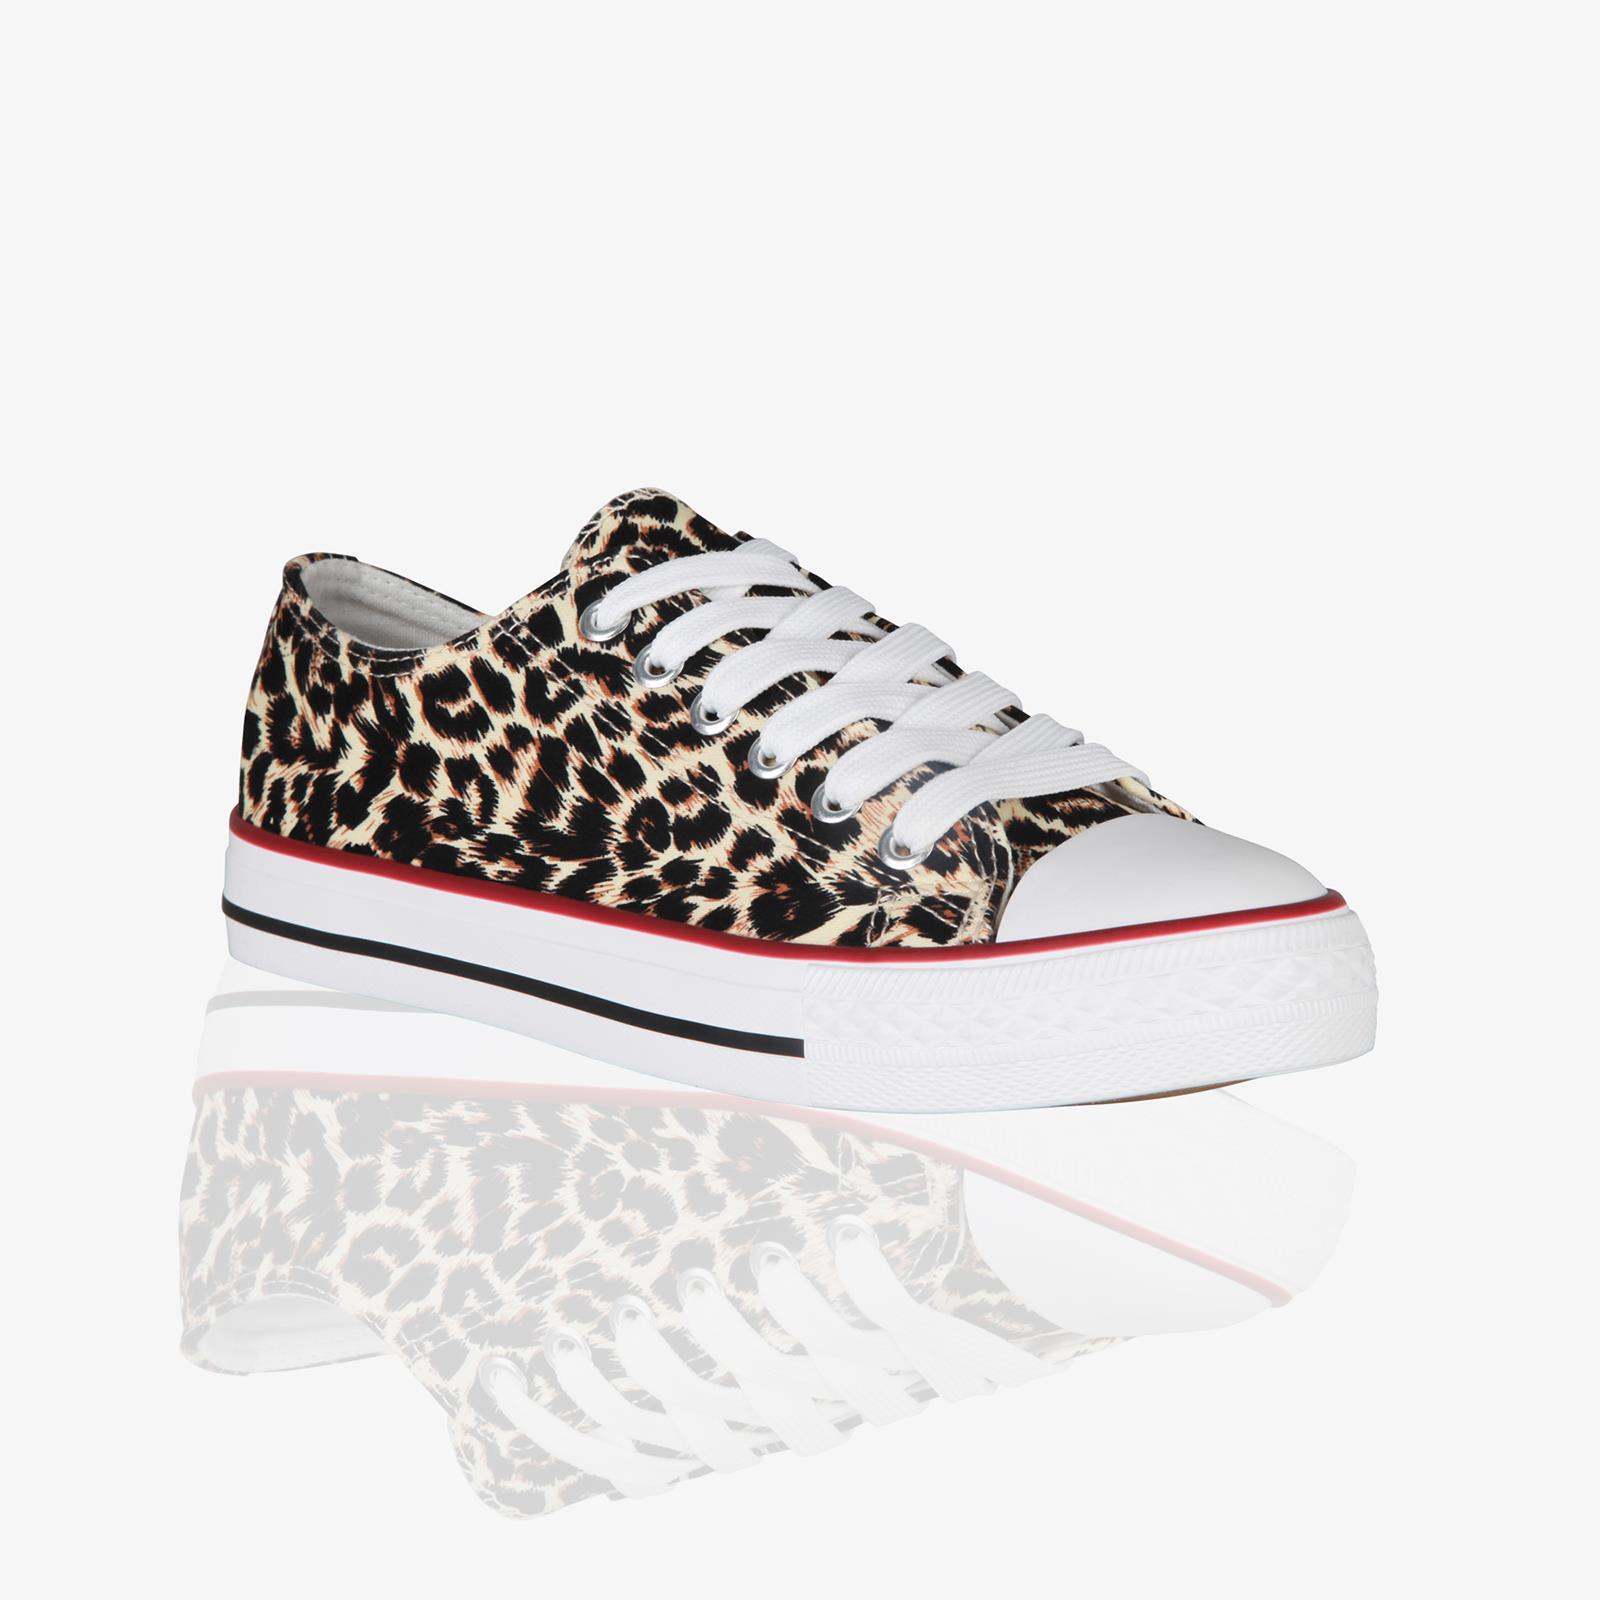 Zapatillas-Mujer-Casuales-Deportiva-Barata-Lona-Moda-Originales-Outlet-Tela-Moda miniatura 23